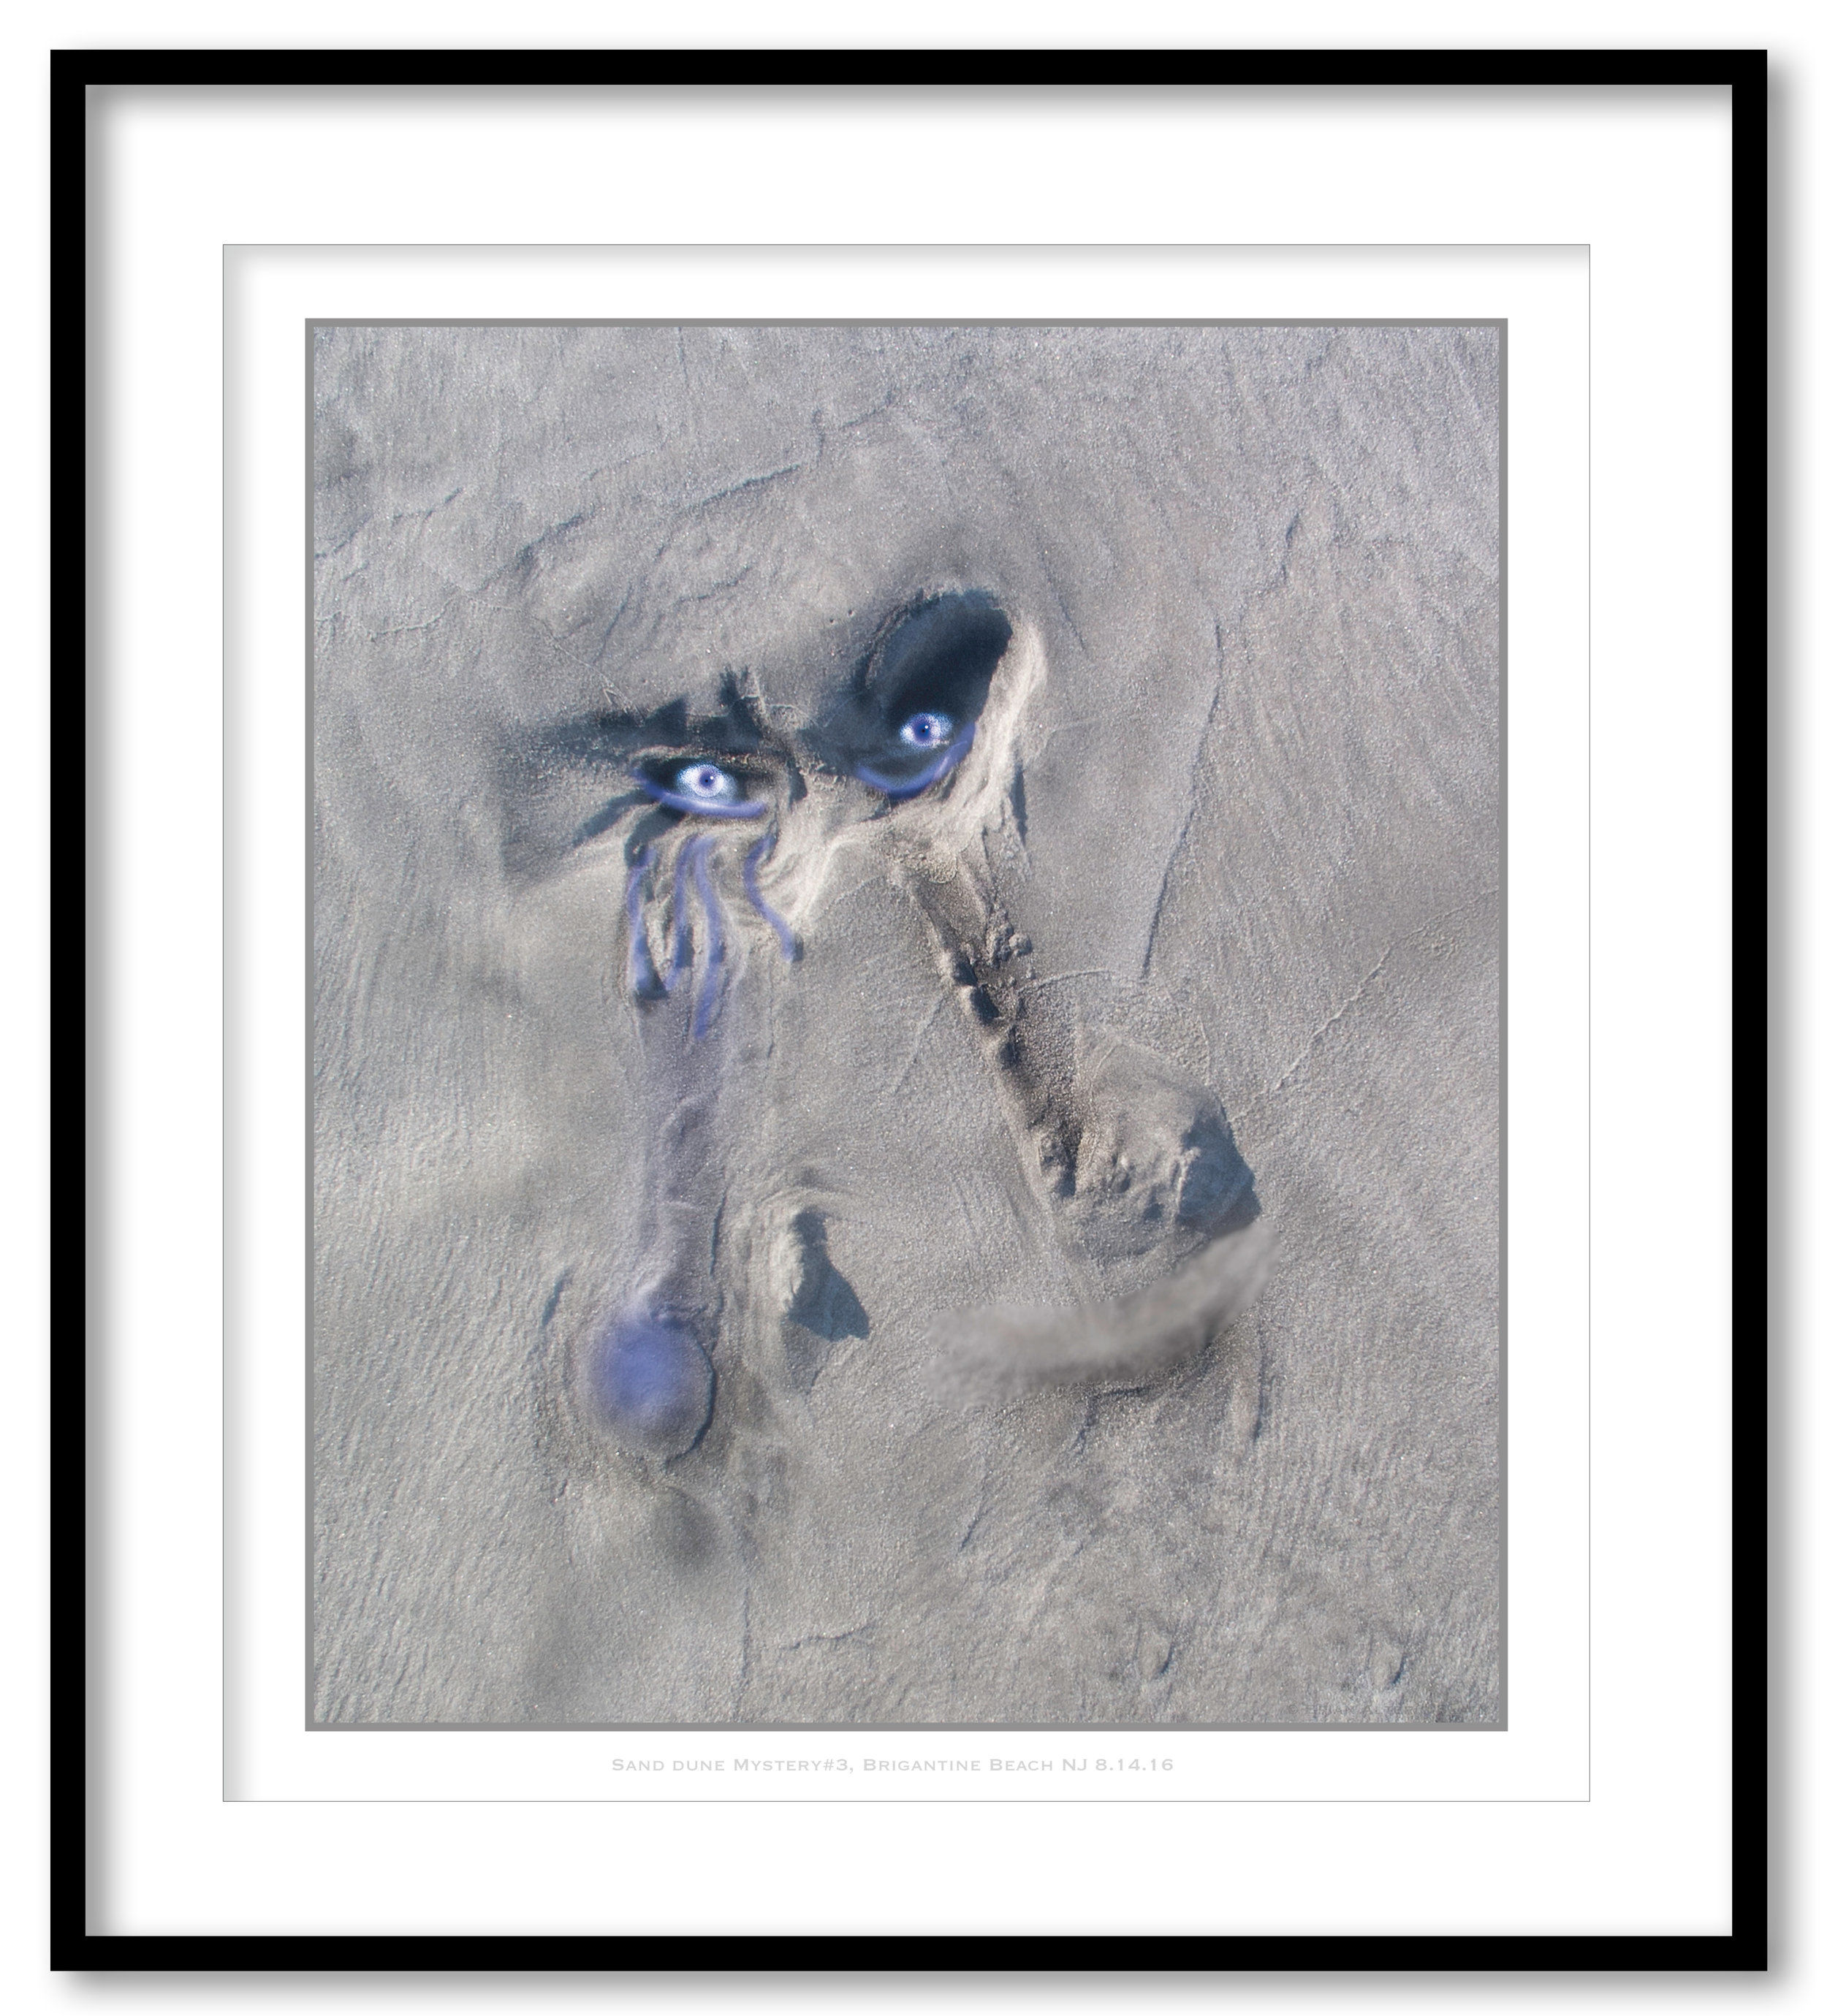 Sand Dune Mystery#3, Brigantine Beach NJ 8.14.16 -Framed.jpg